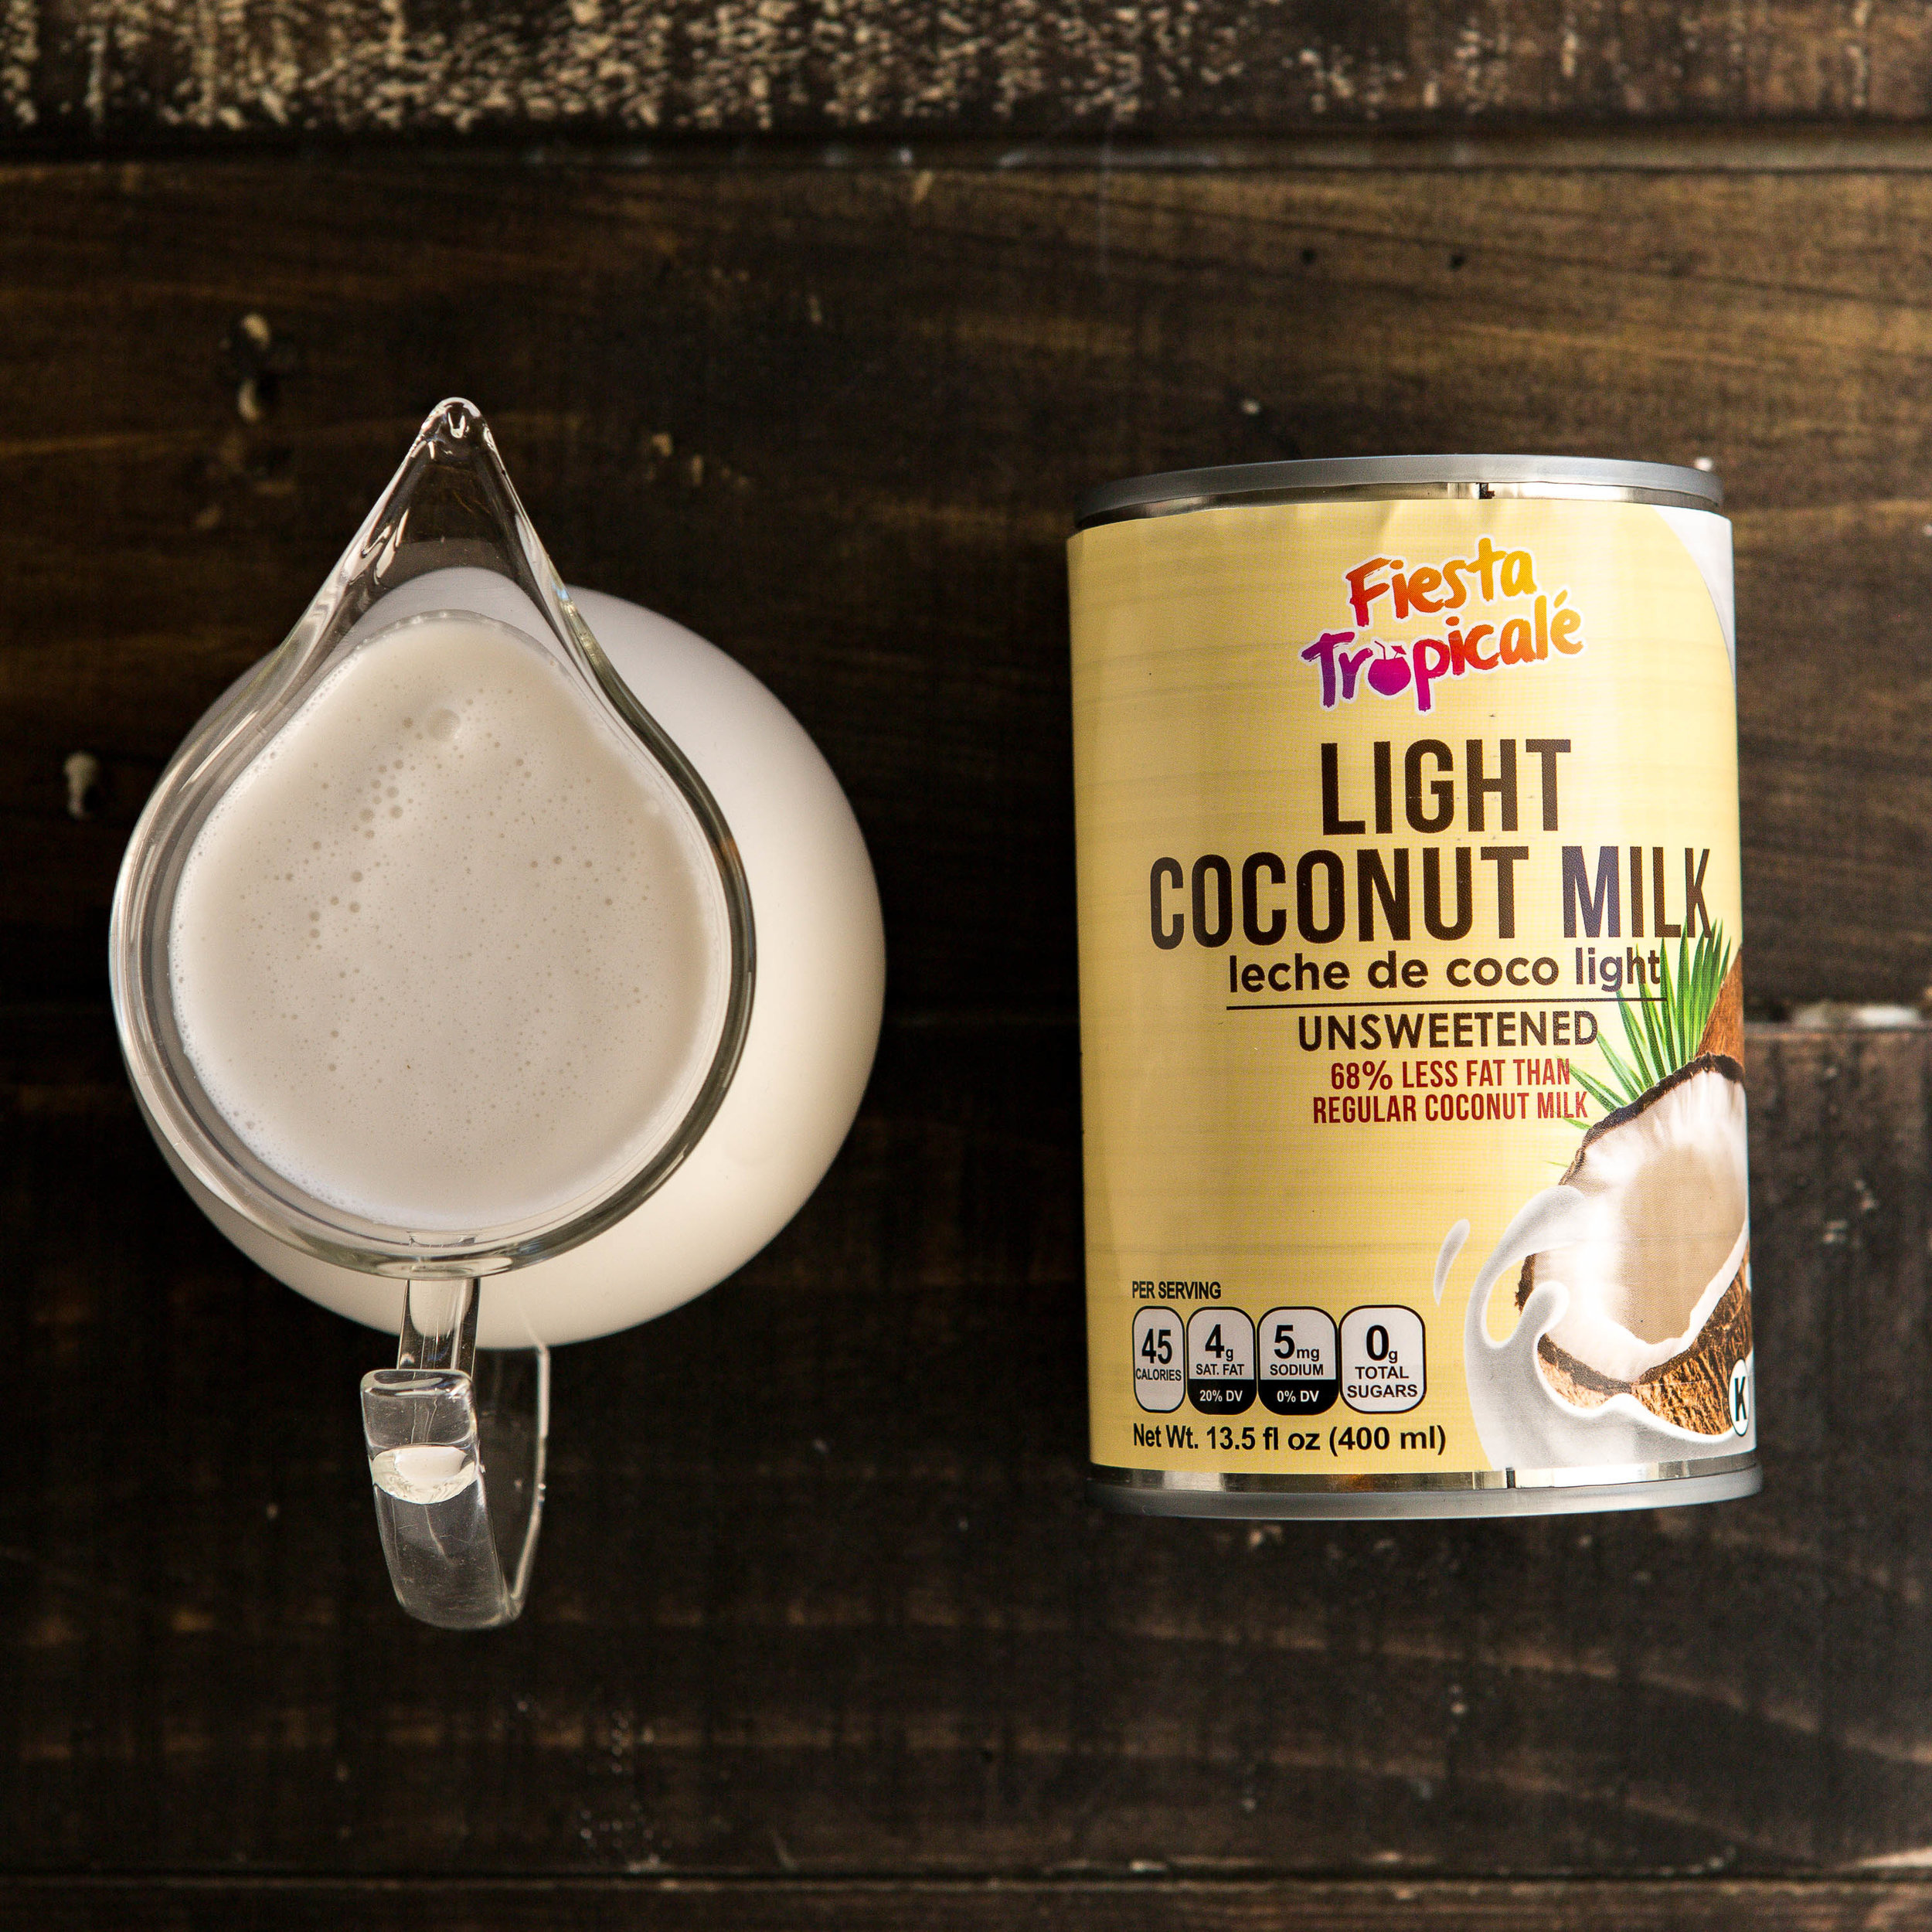 Fiesta Tropicale Light Coconut Milk